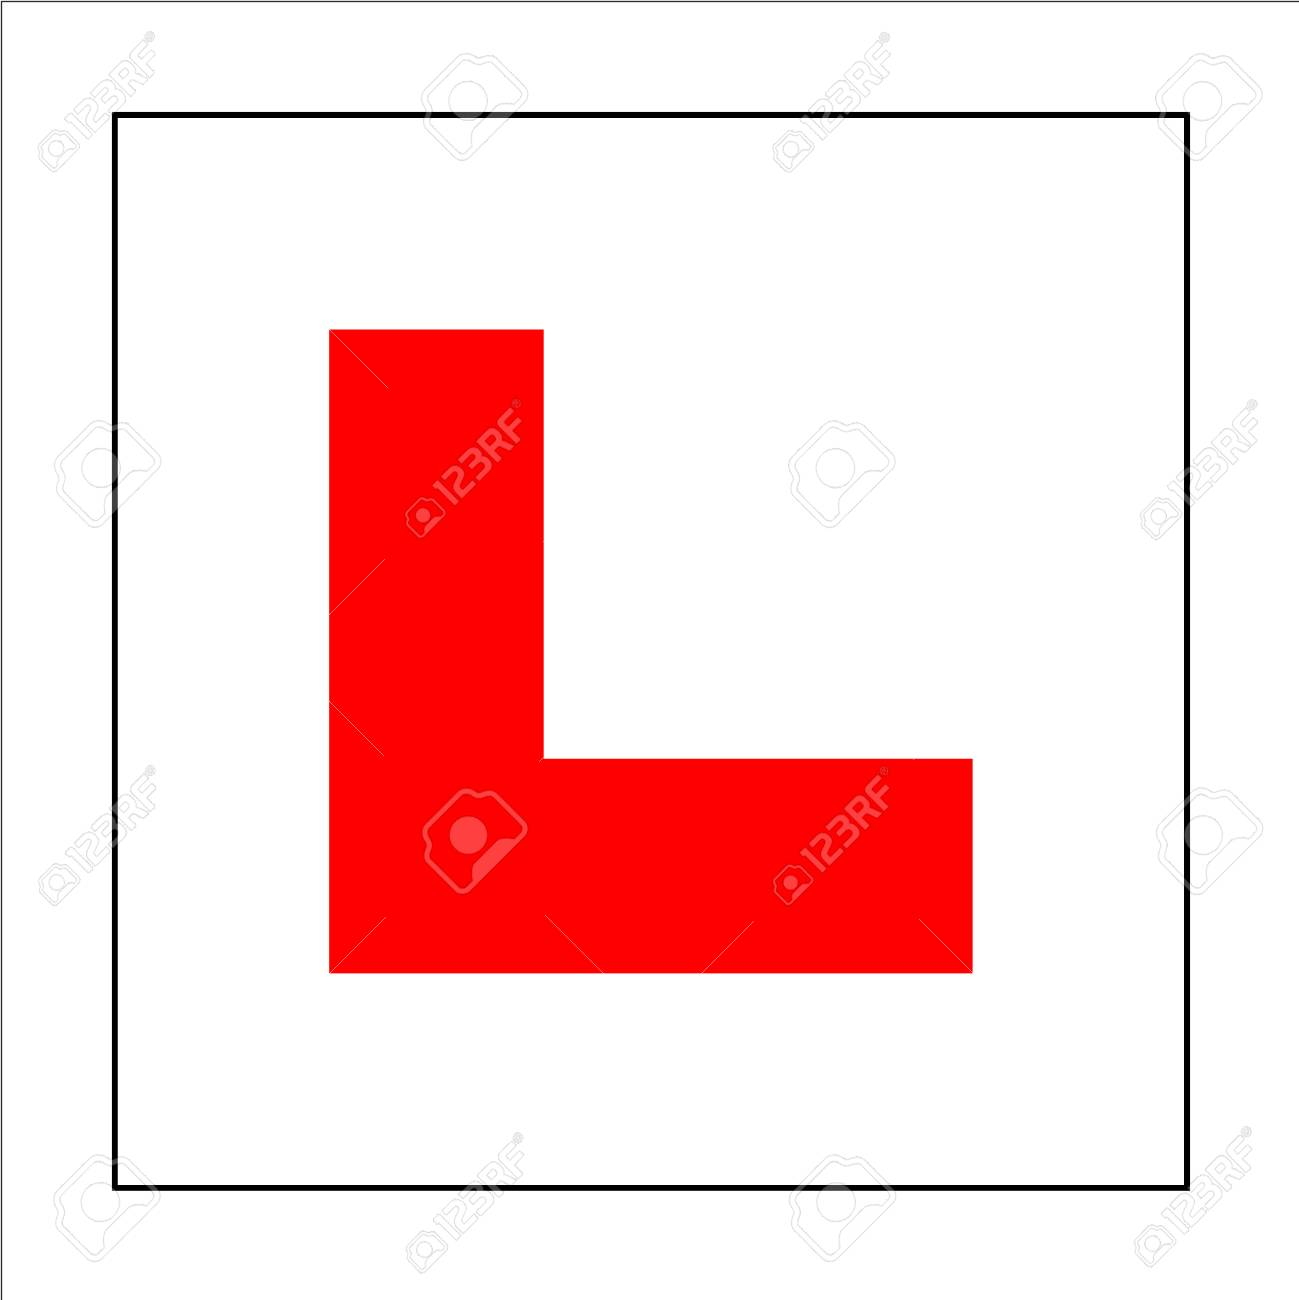 Learner driver plate sign car driving school beginner symbol red letter l on square